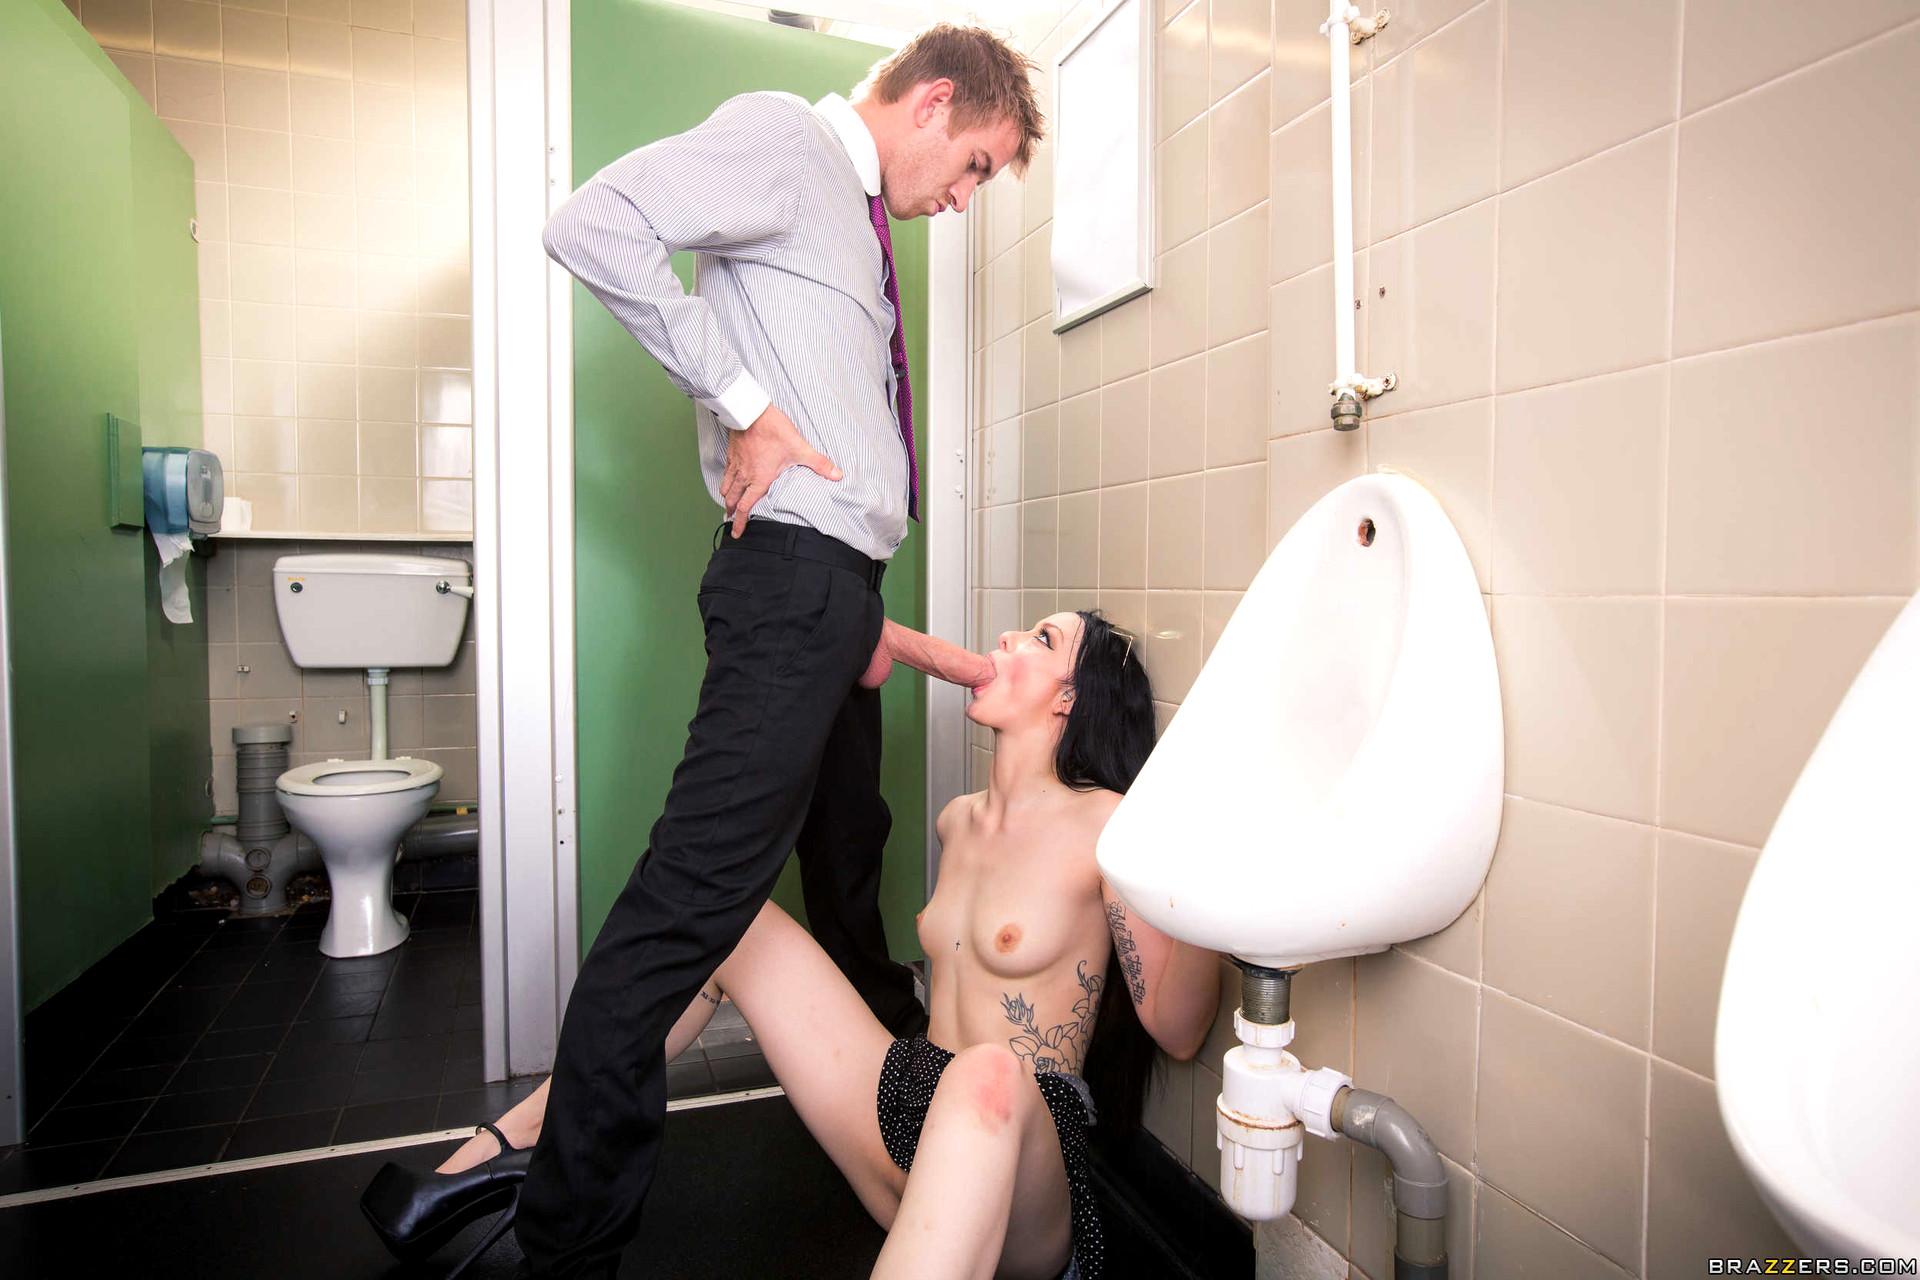 Муж жена туалет порно смотреть